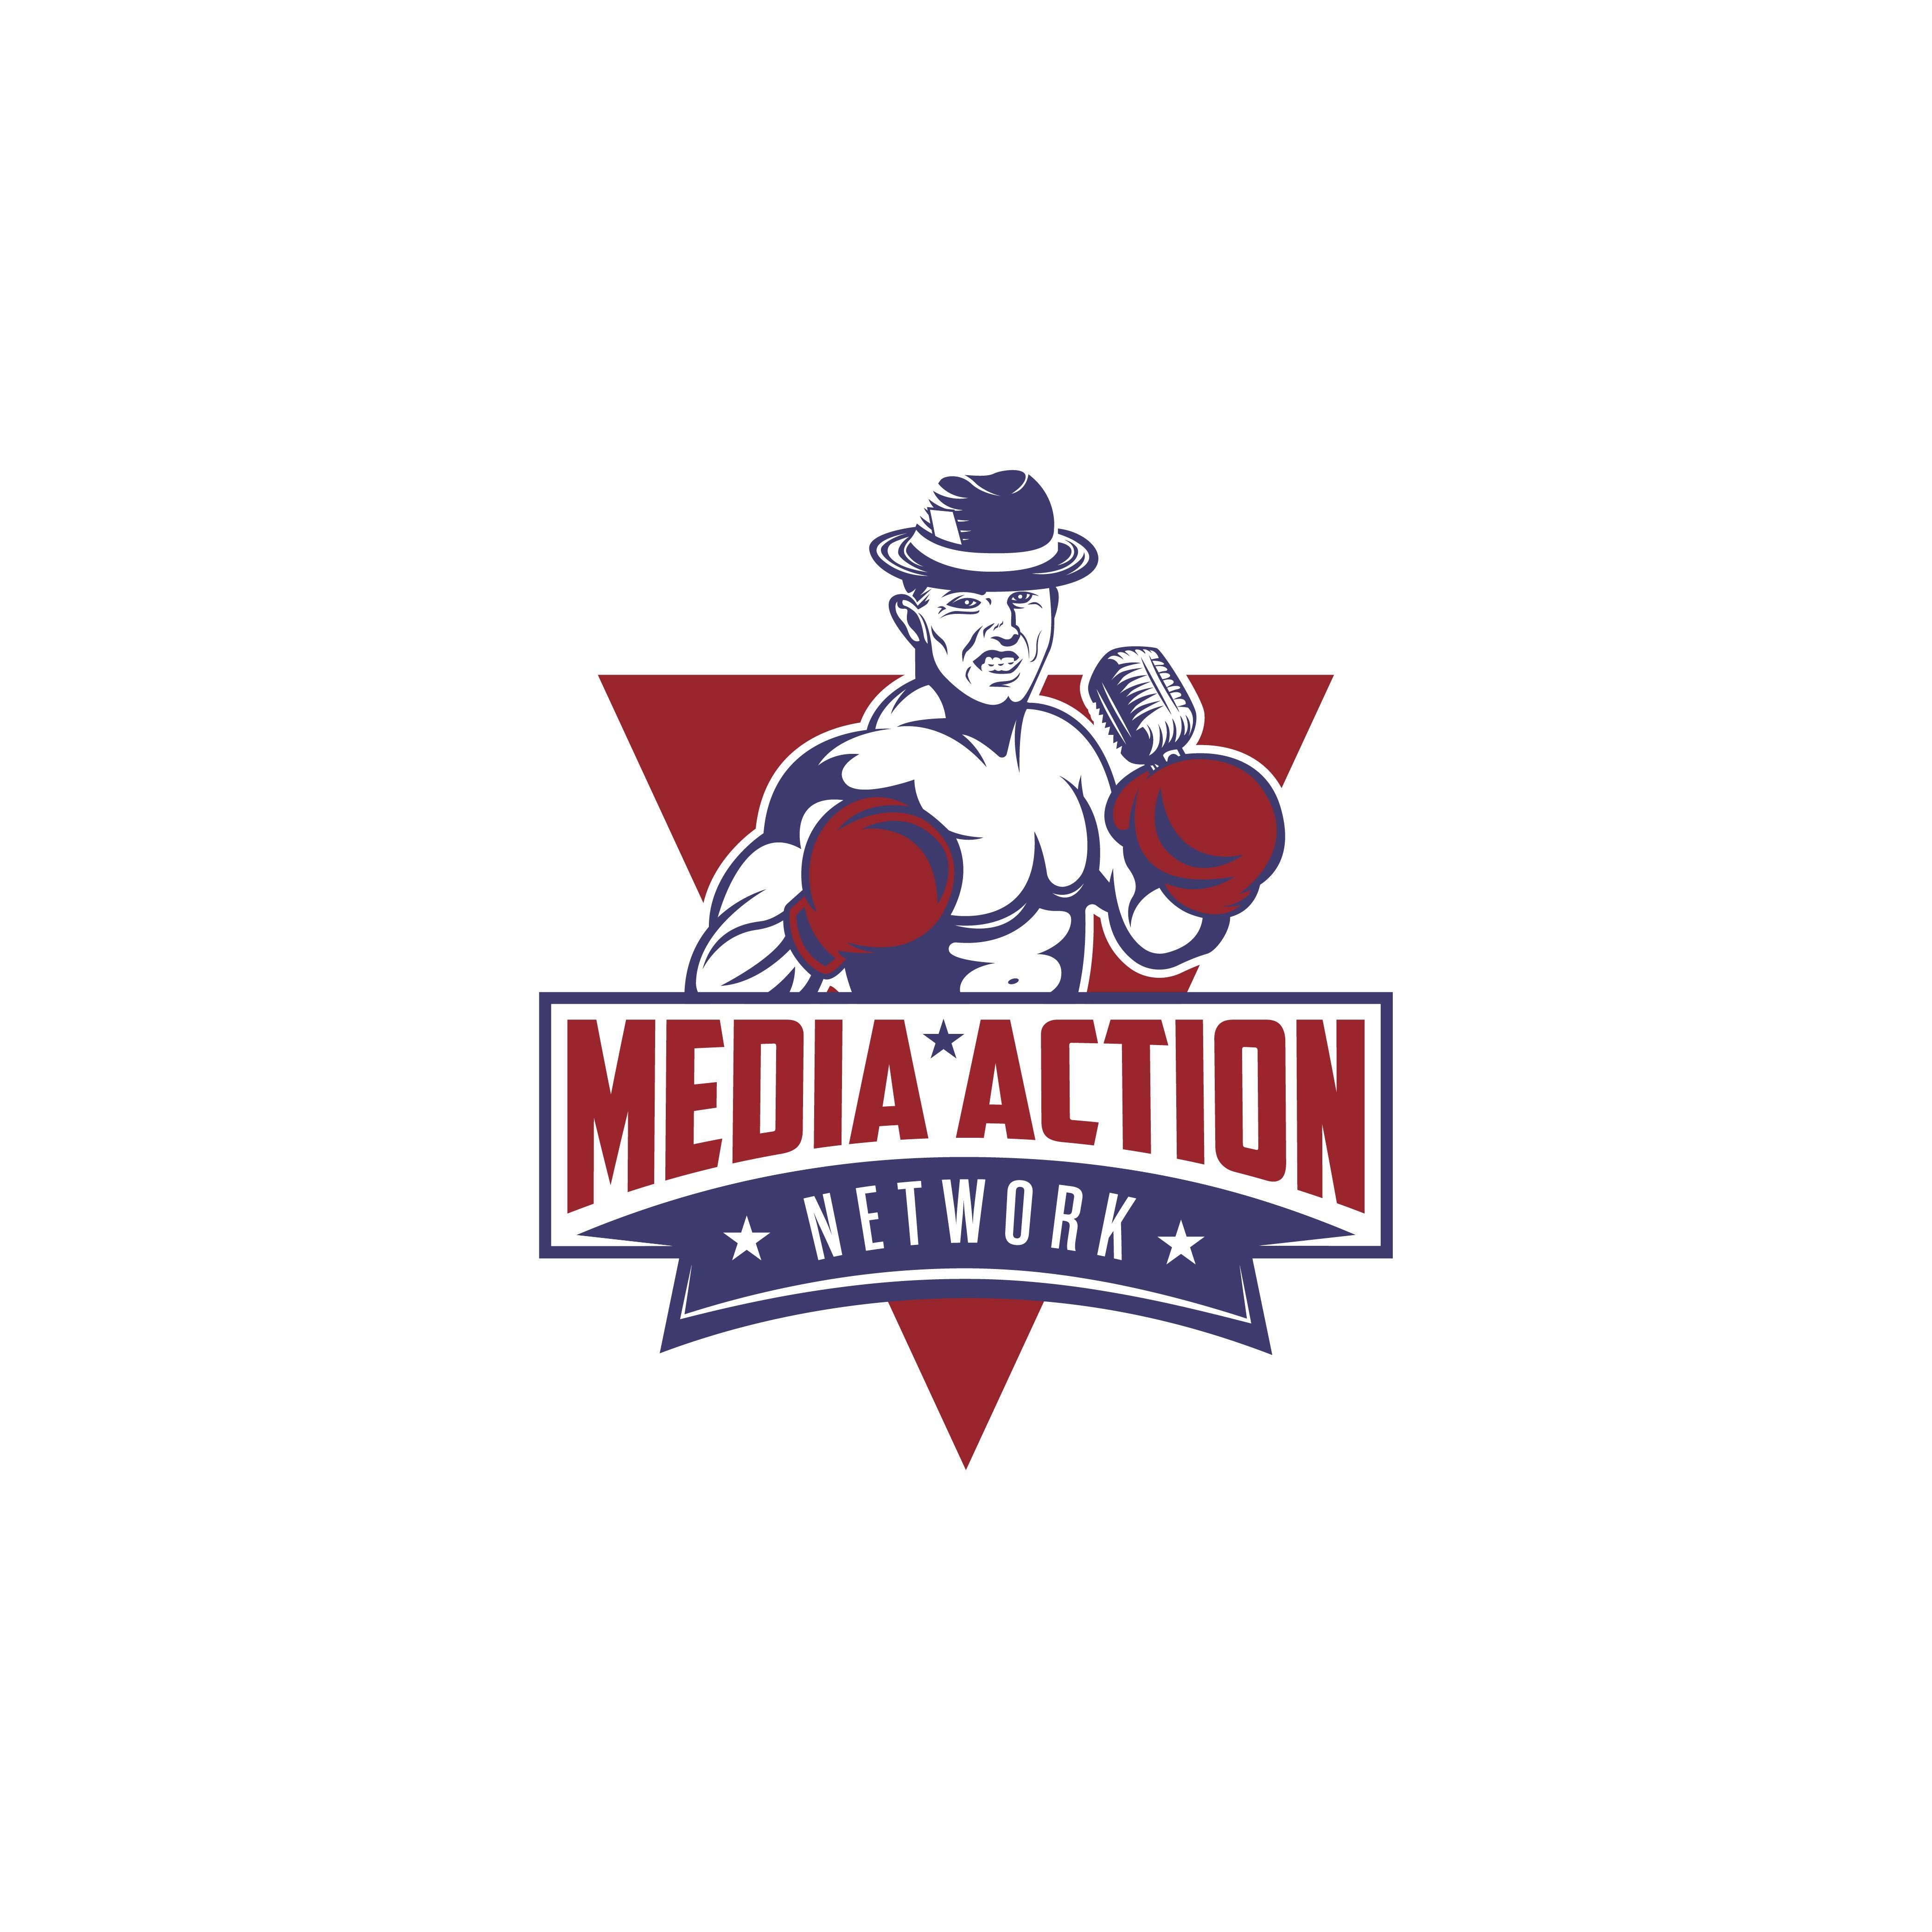 Media Action Network logo